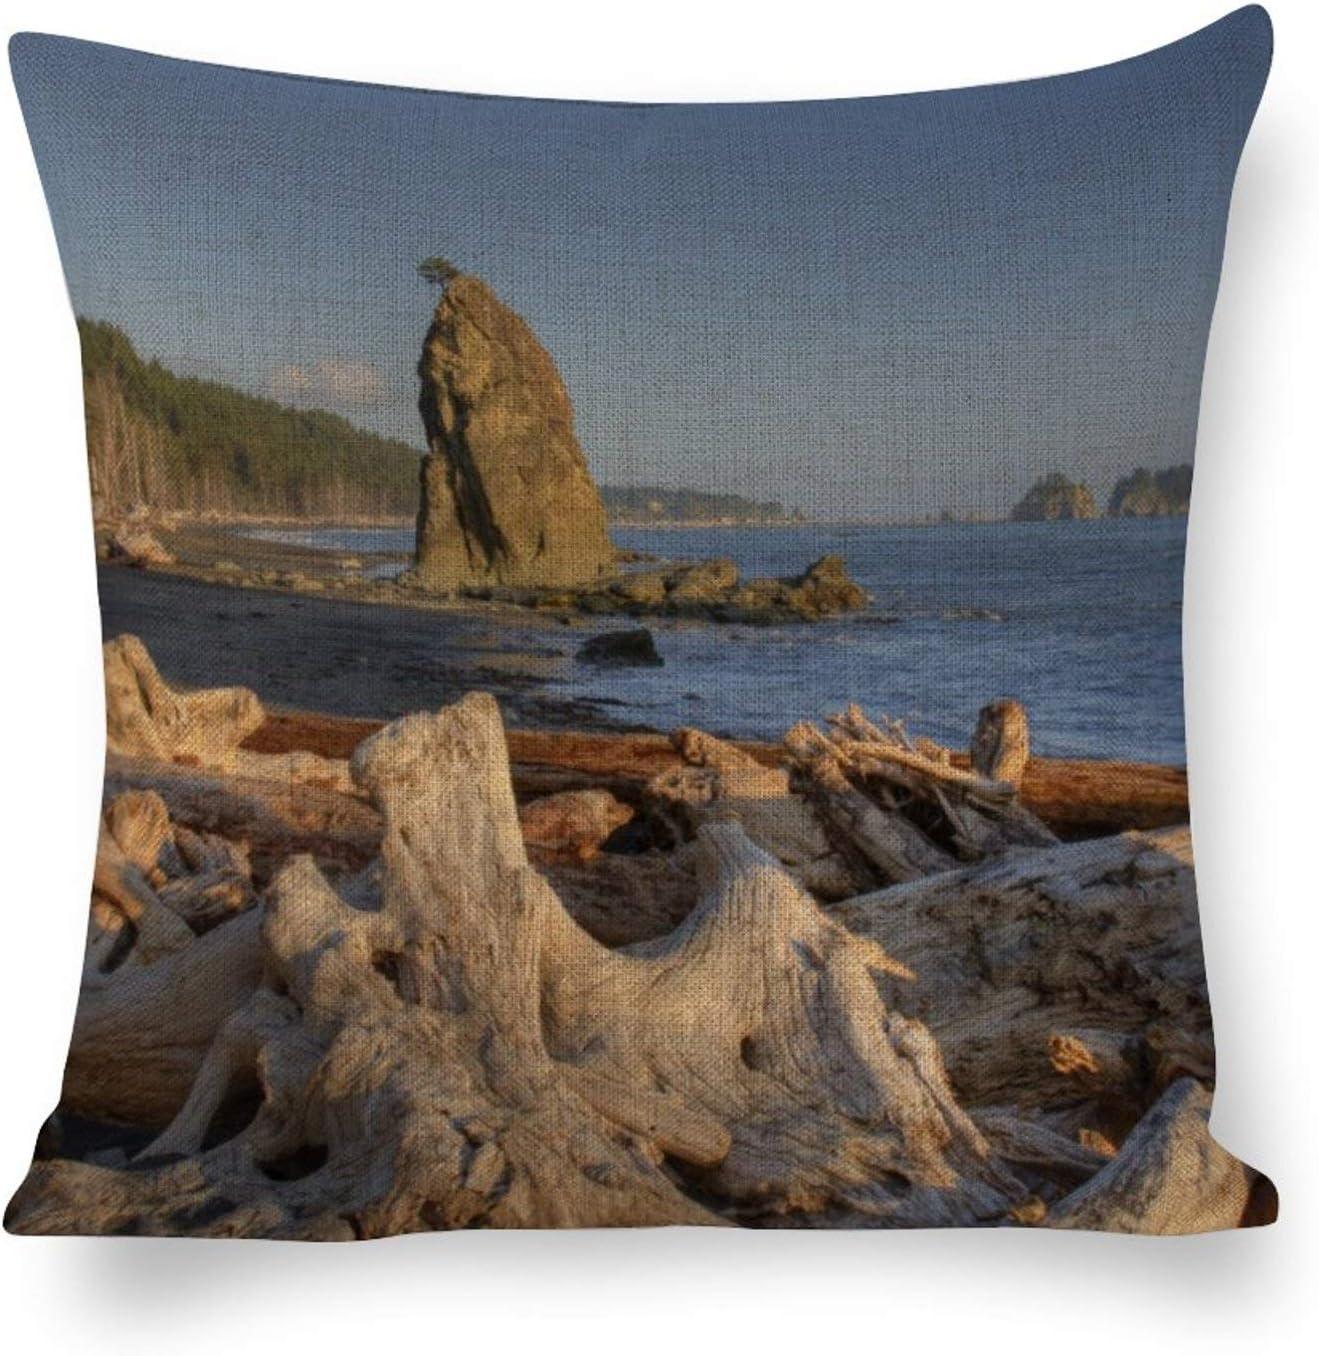 Tamengi USA Washington Olympic National Park Rialto Canvas Throw Pillow Covers Cases 16''×16'', for Home Sofa Car Outdoor Decor Cushion Cover, Square Pillowcase Housewarming Gift